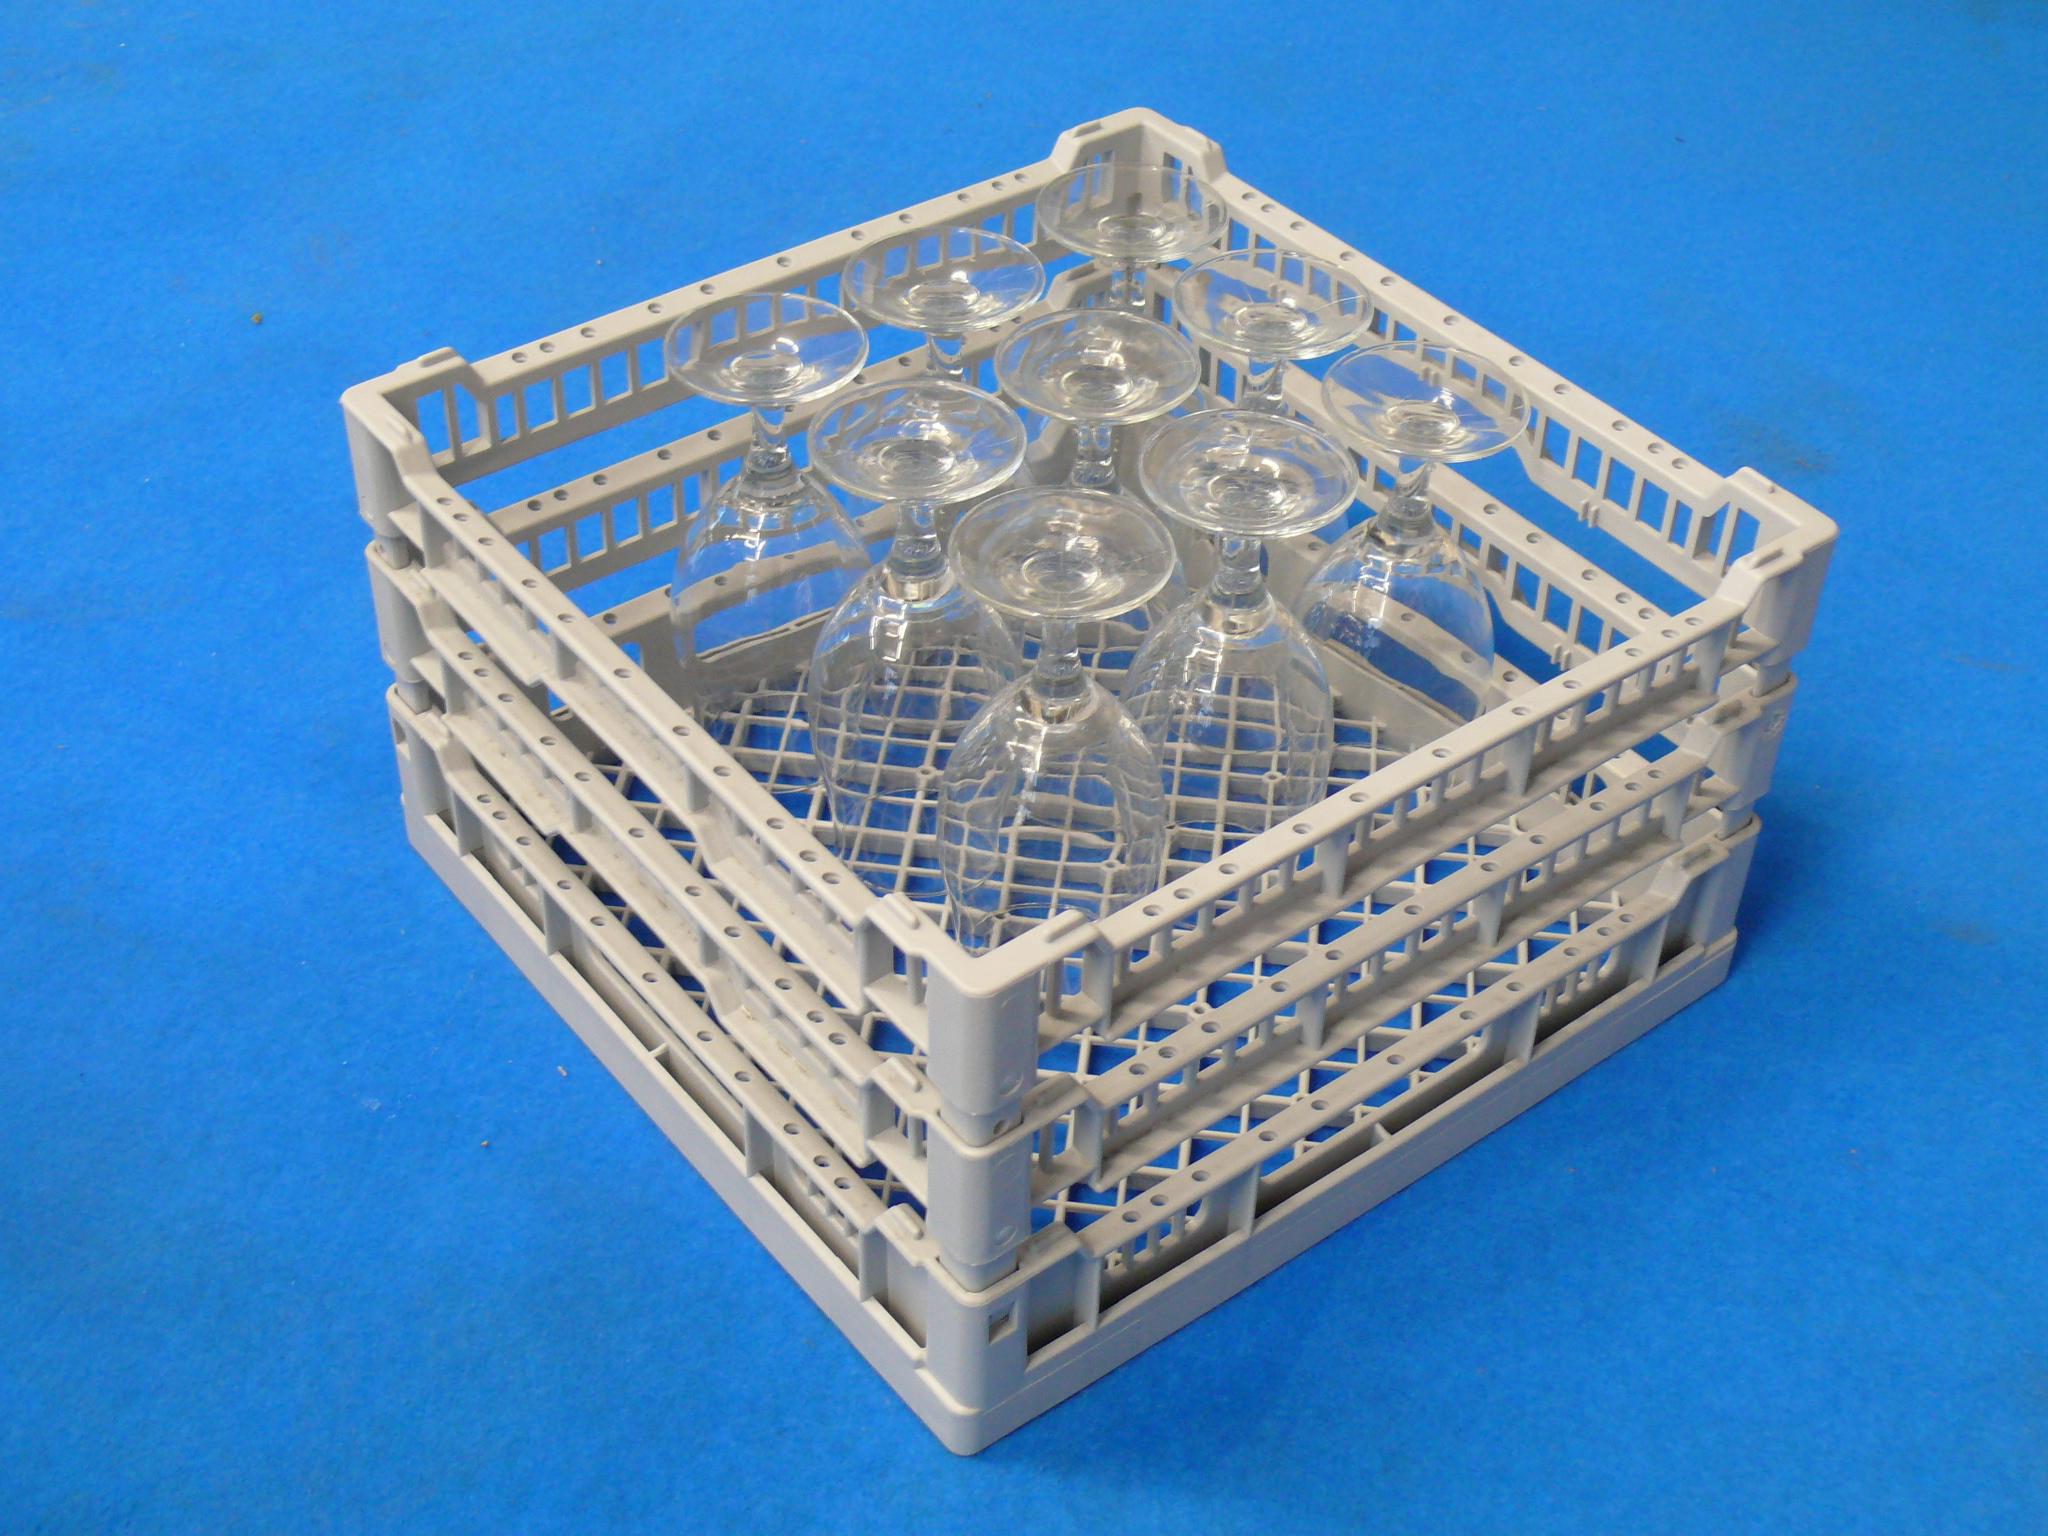 Eurodib USA CC00130 commercial dishwashers & glasswashers - accessories